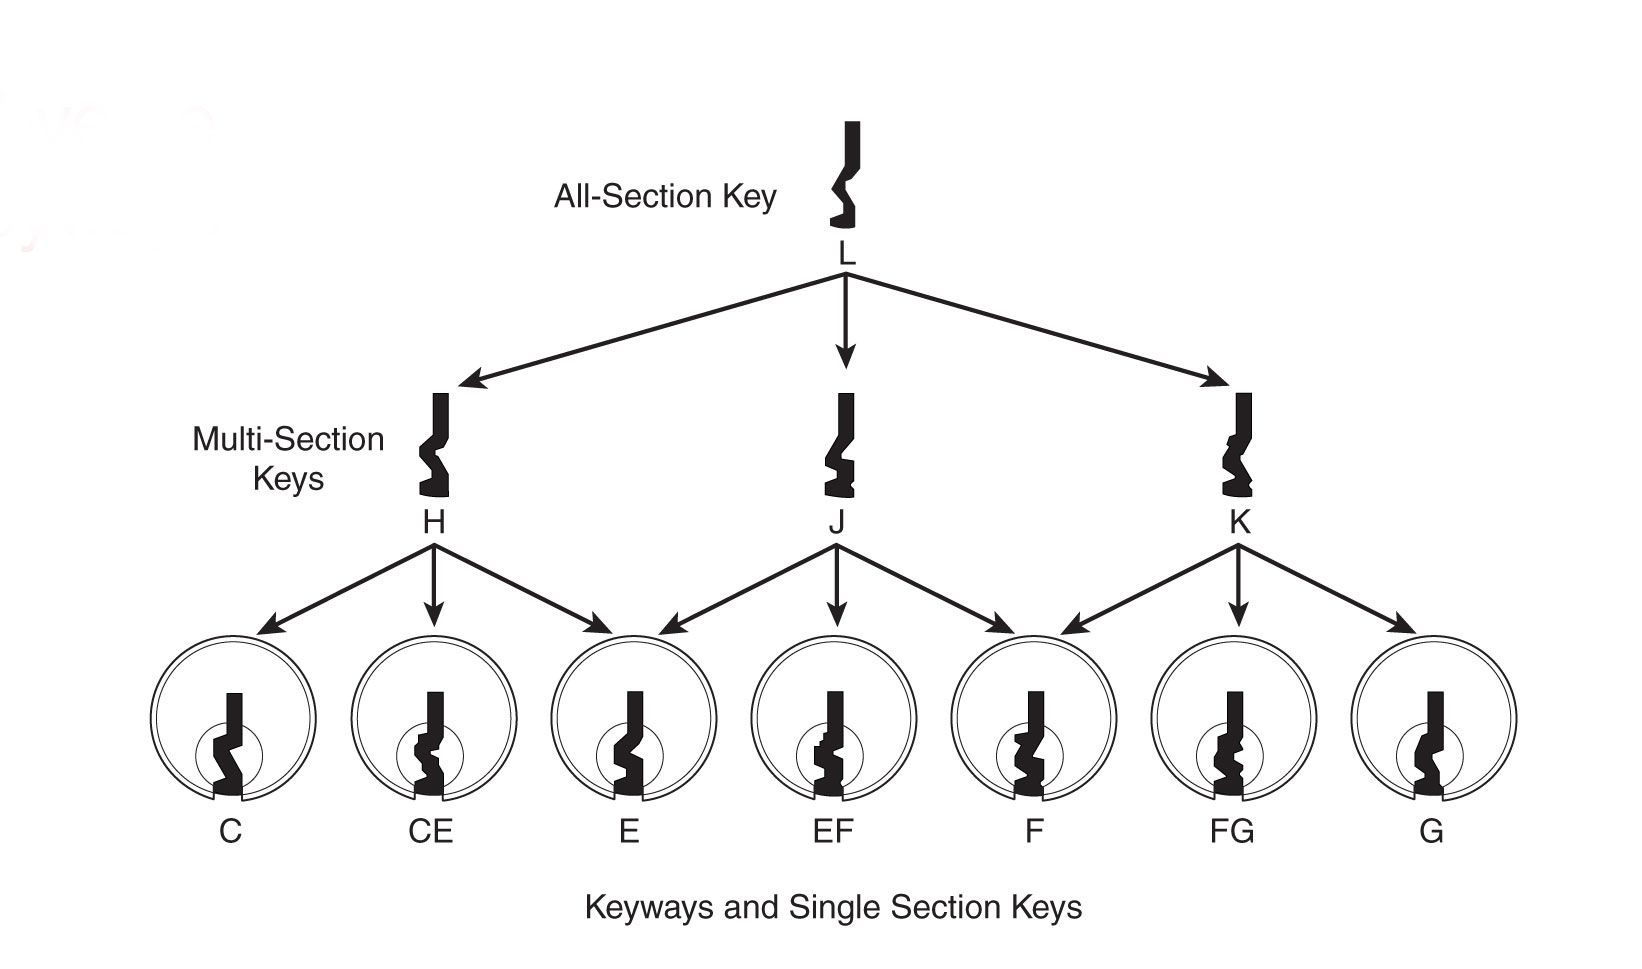 Schlage Classic Keyways And Single Section Keys Diagram Mr Locksmith Schlage Diagram Image